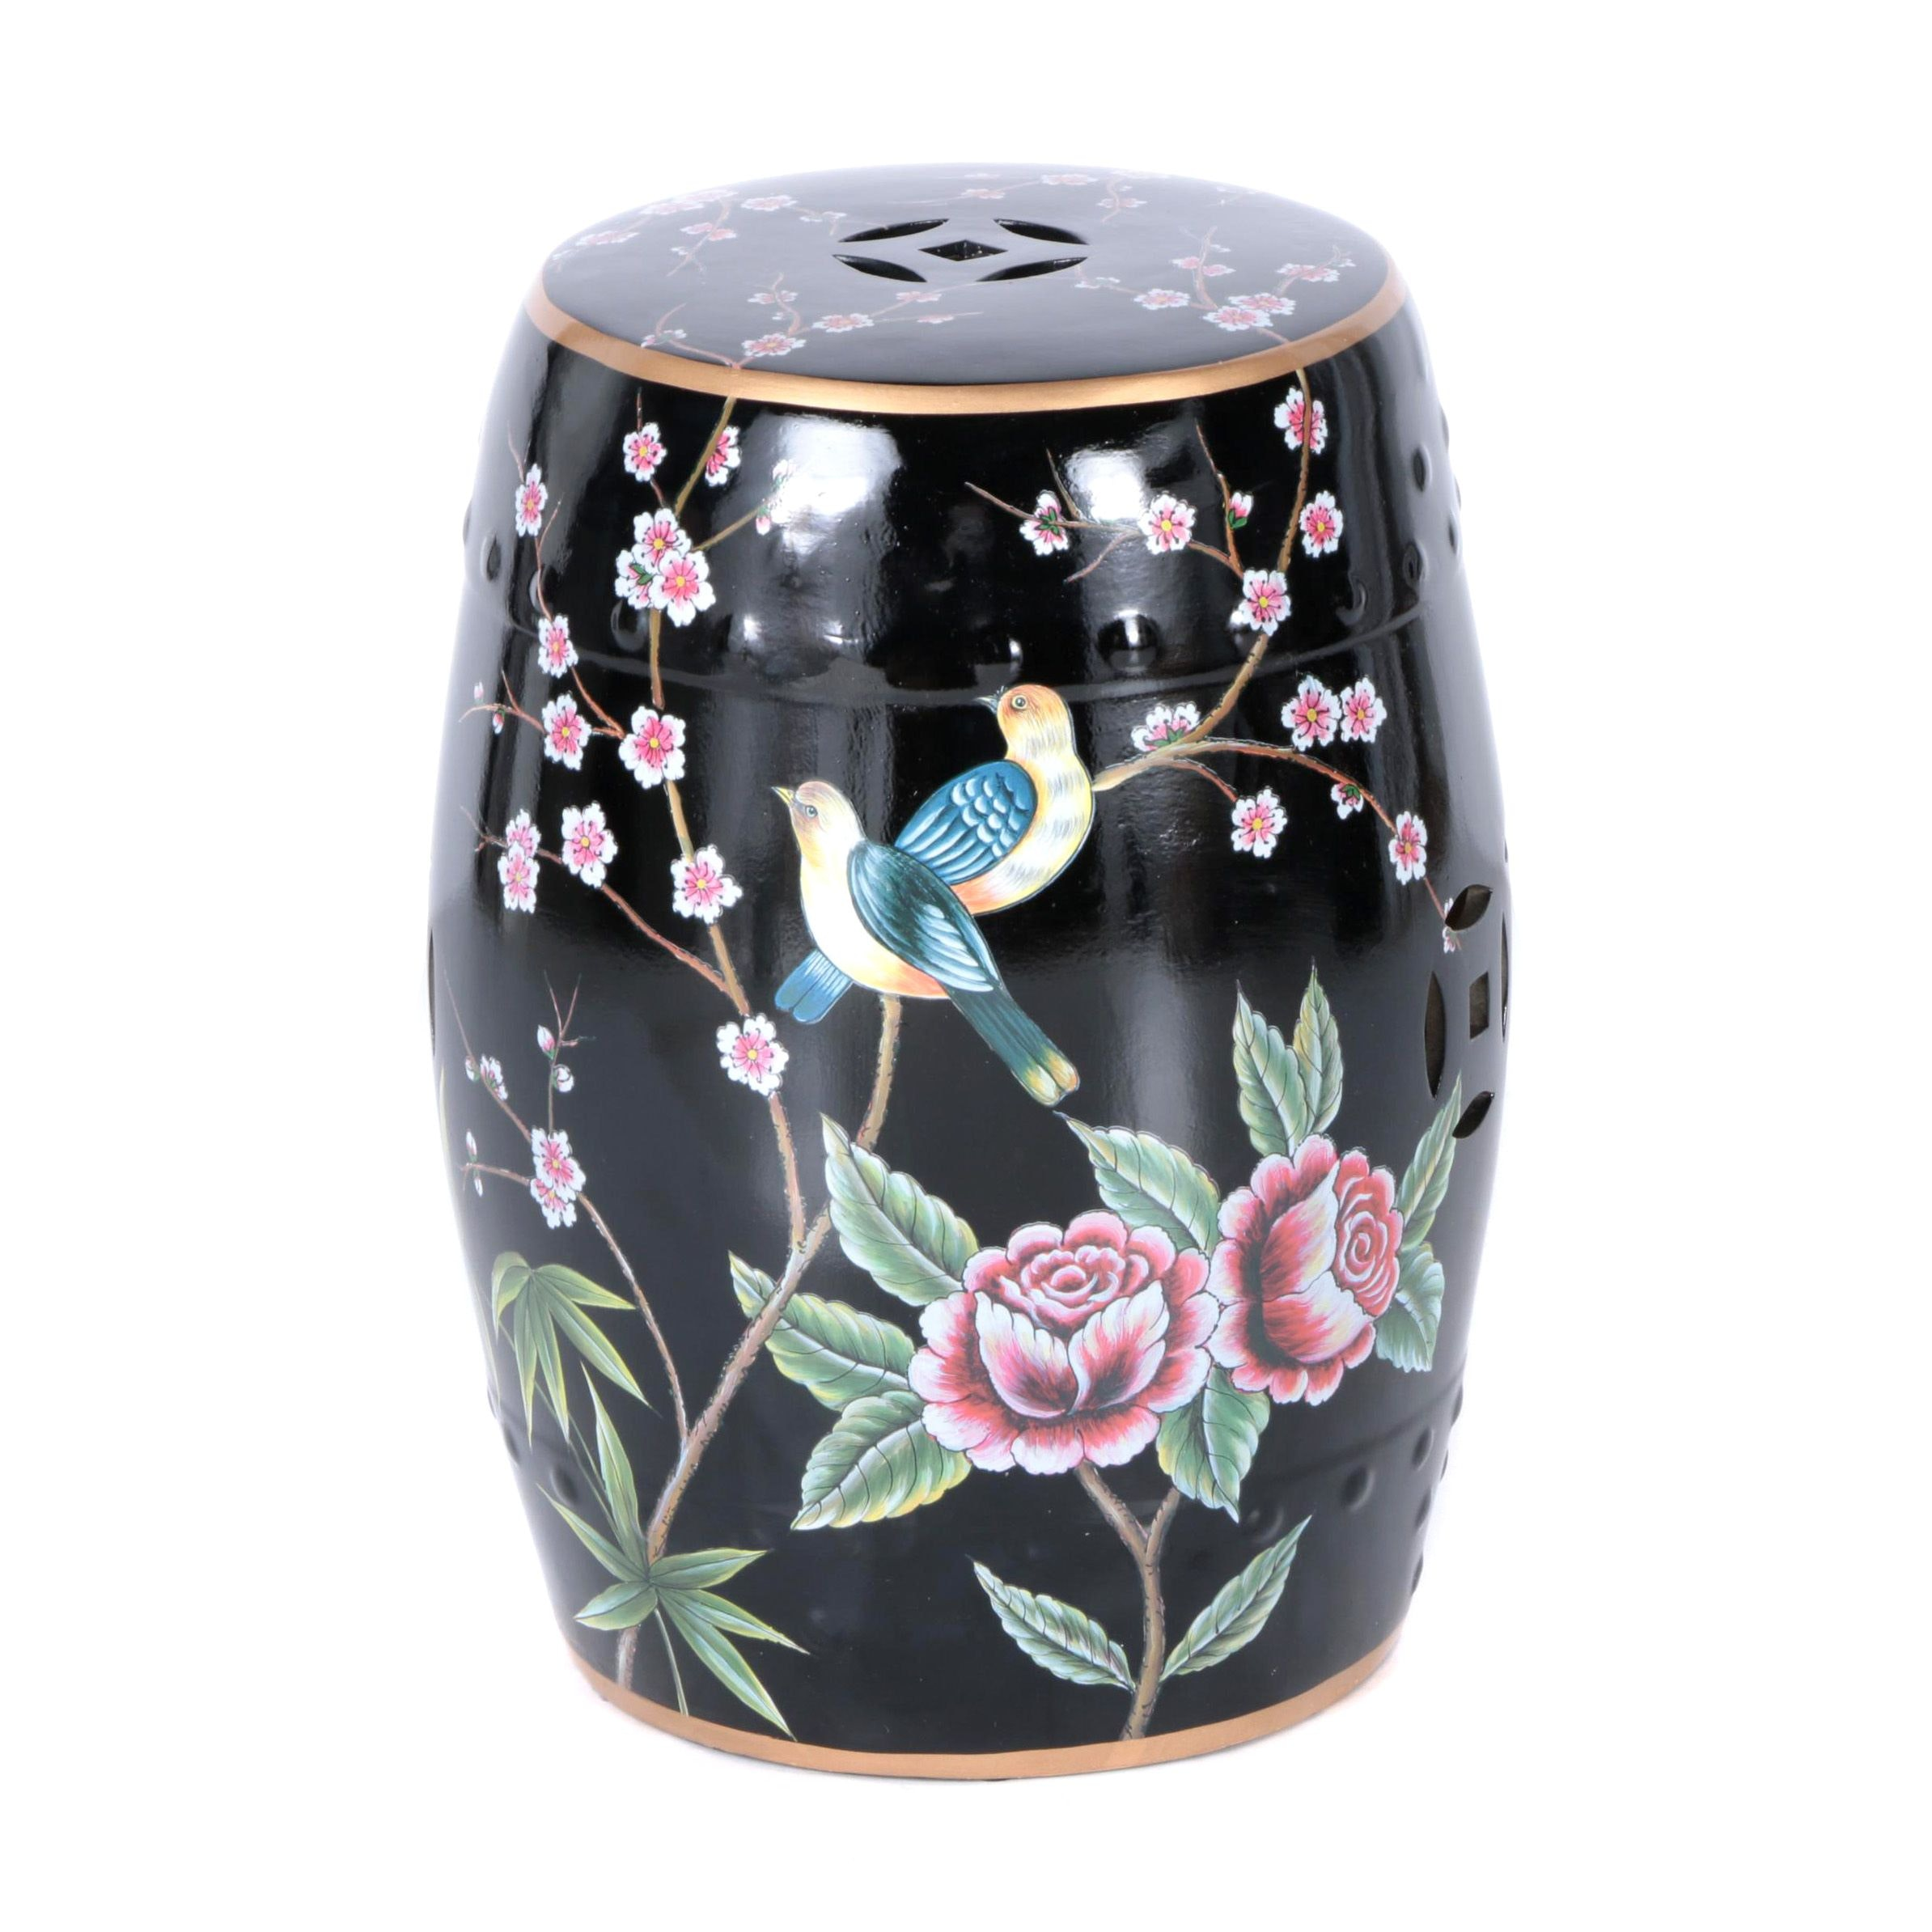 Floral Themed Black Ceramic Garden Stool